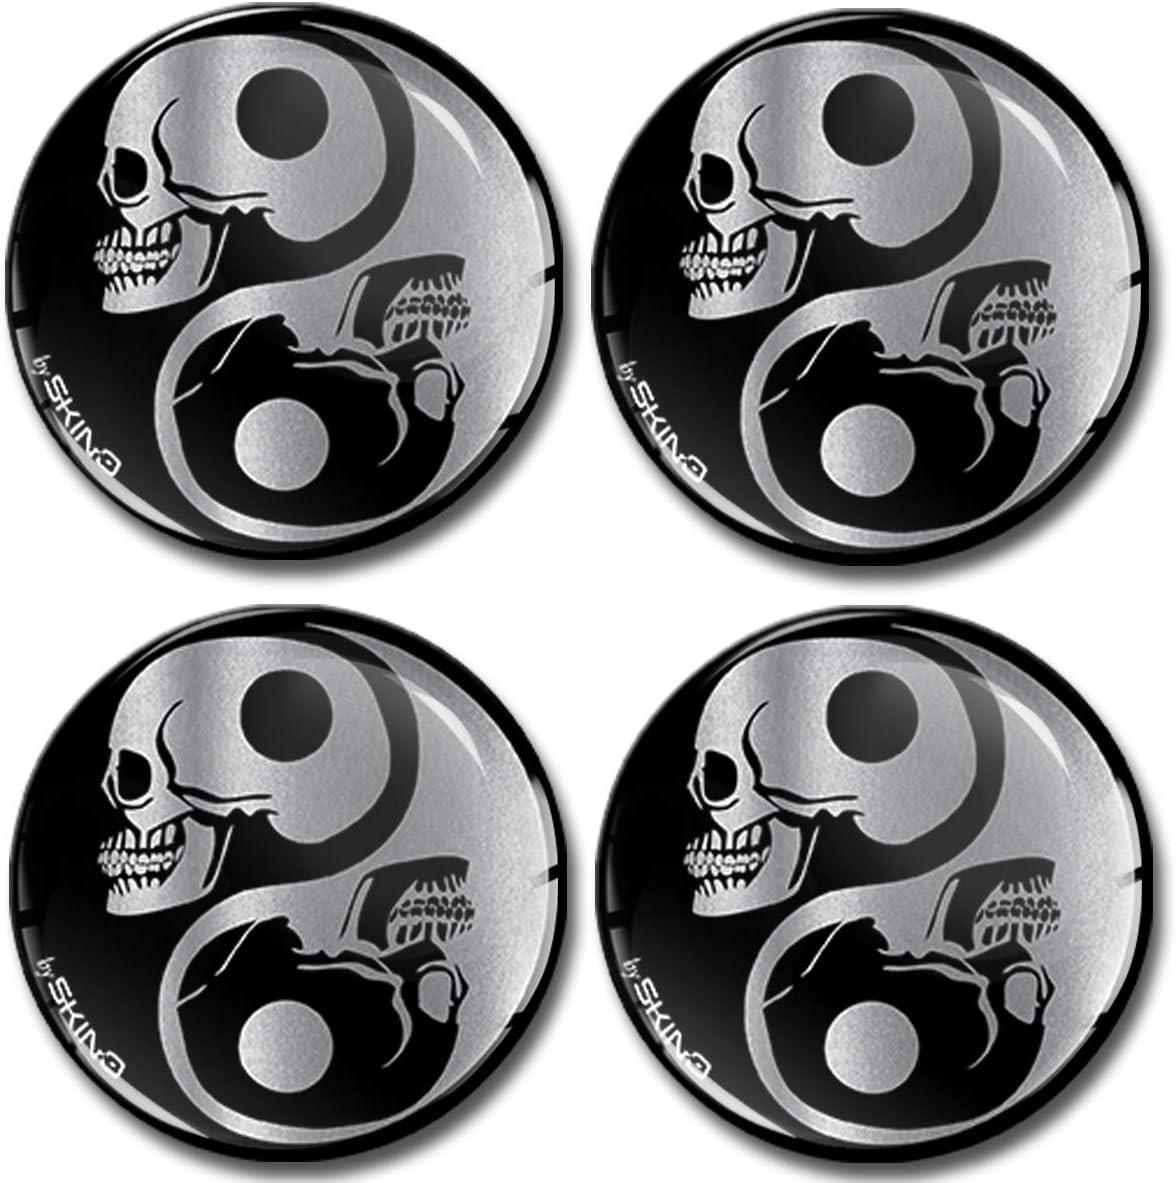 Skinoeu 4 X 55mm Aufkleber 3d Gel Silikon Stickers Symbol Yin Yang Silber Skulls Schädel Totenkopf Felgenaufkleber Für Radkappen Nabenkappen Radnabendeckel Nabendeckel Auto Tuning A 8255 Auto